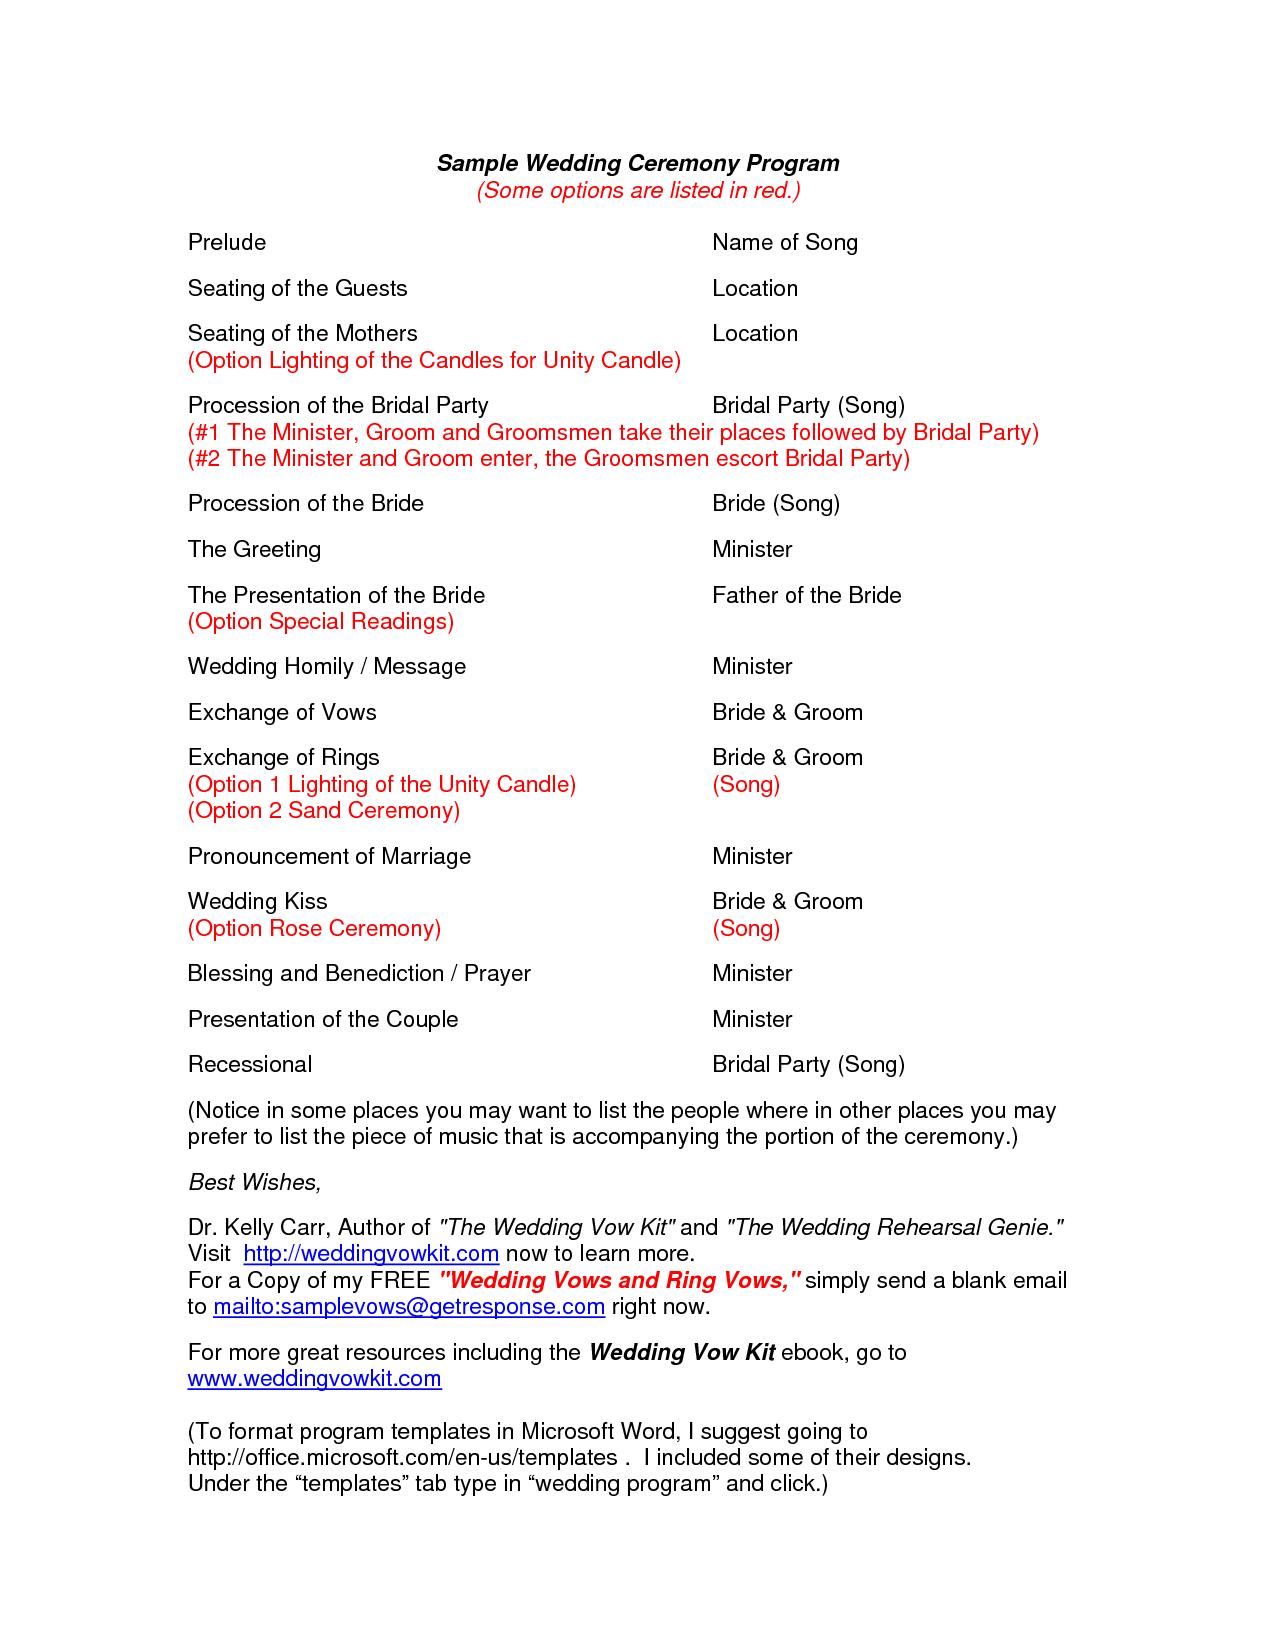 Wedding Program Outline Samples